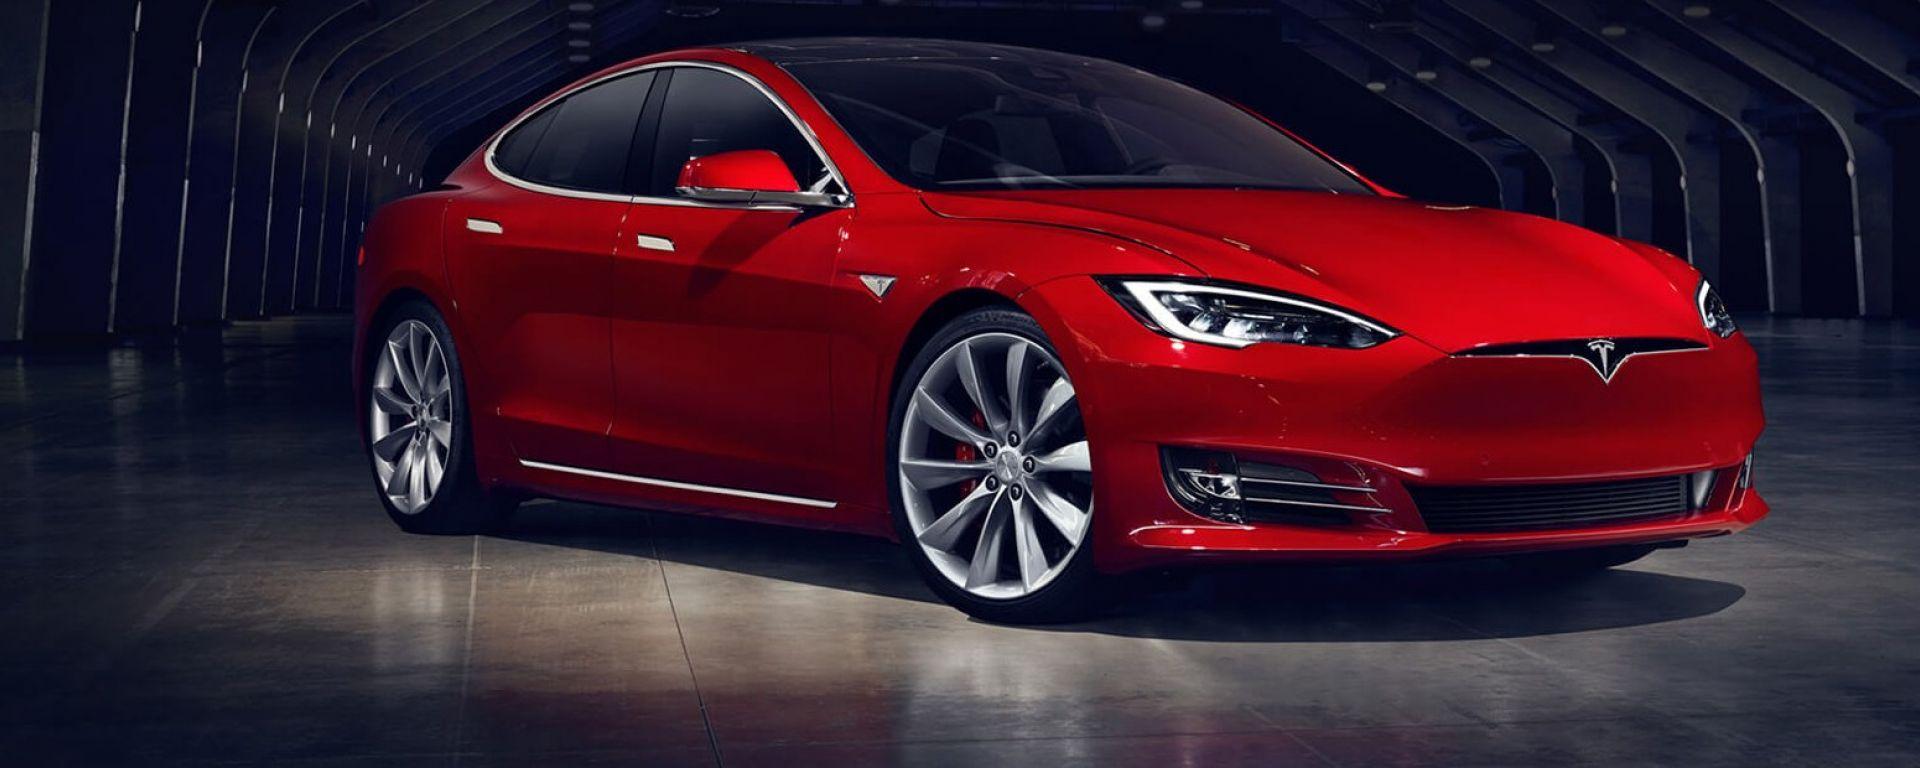 Tesla Model S: vista 3/4 anteriore